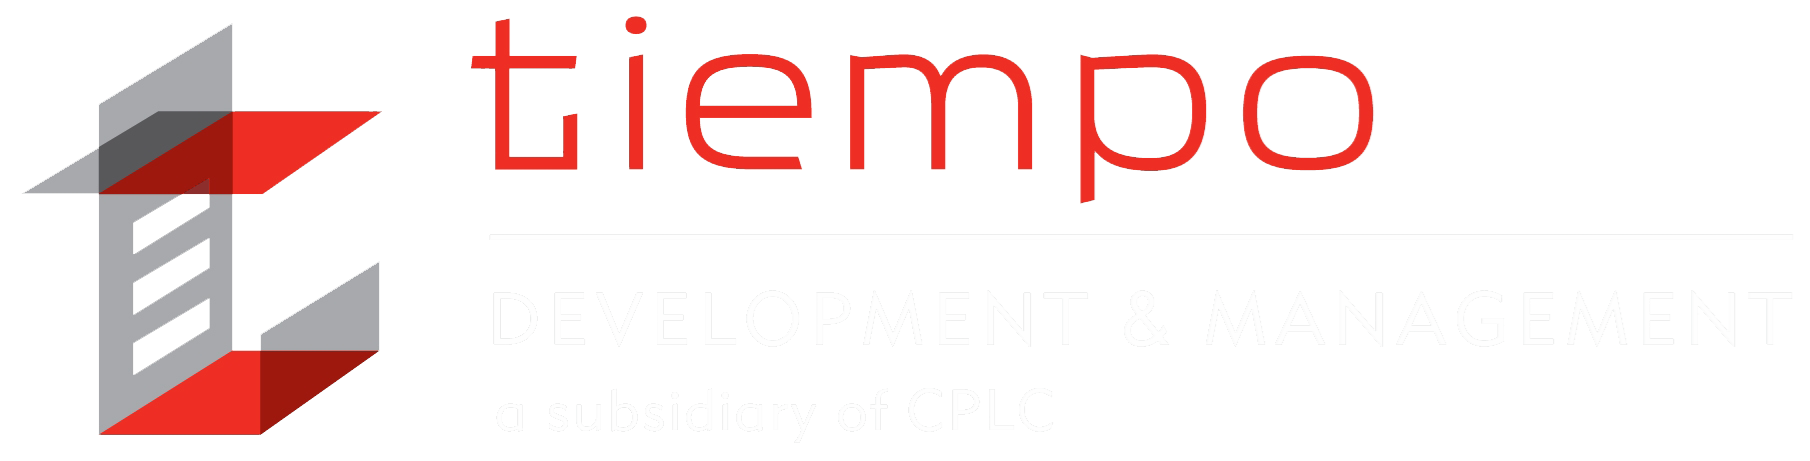 Phoenix Property Logo 39